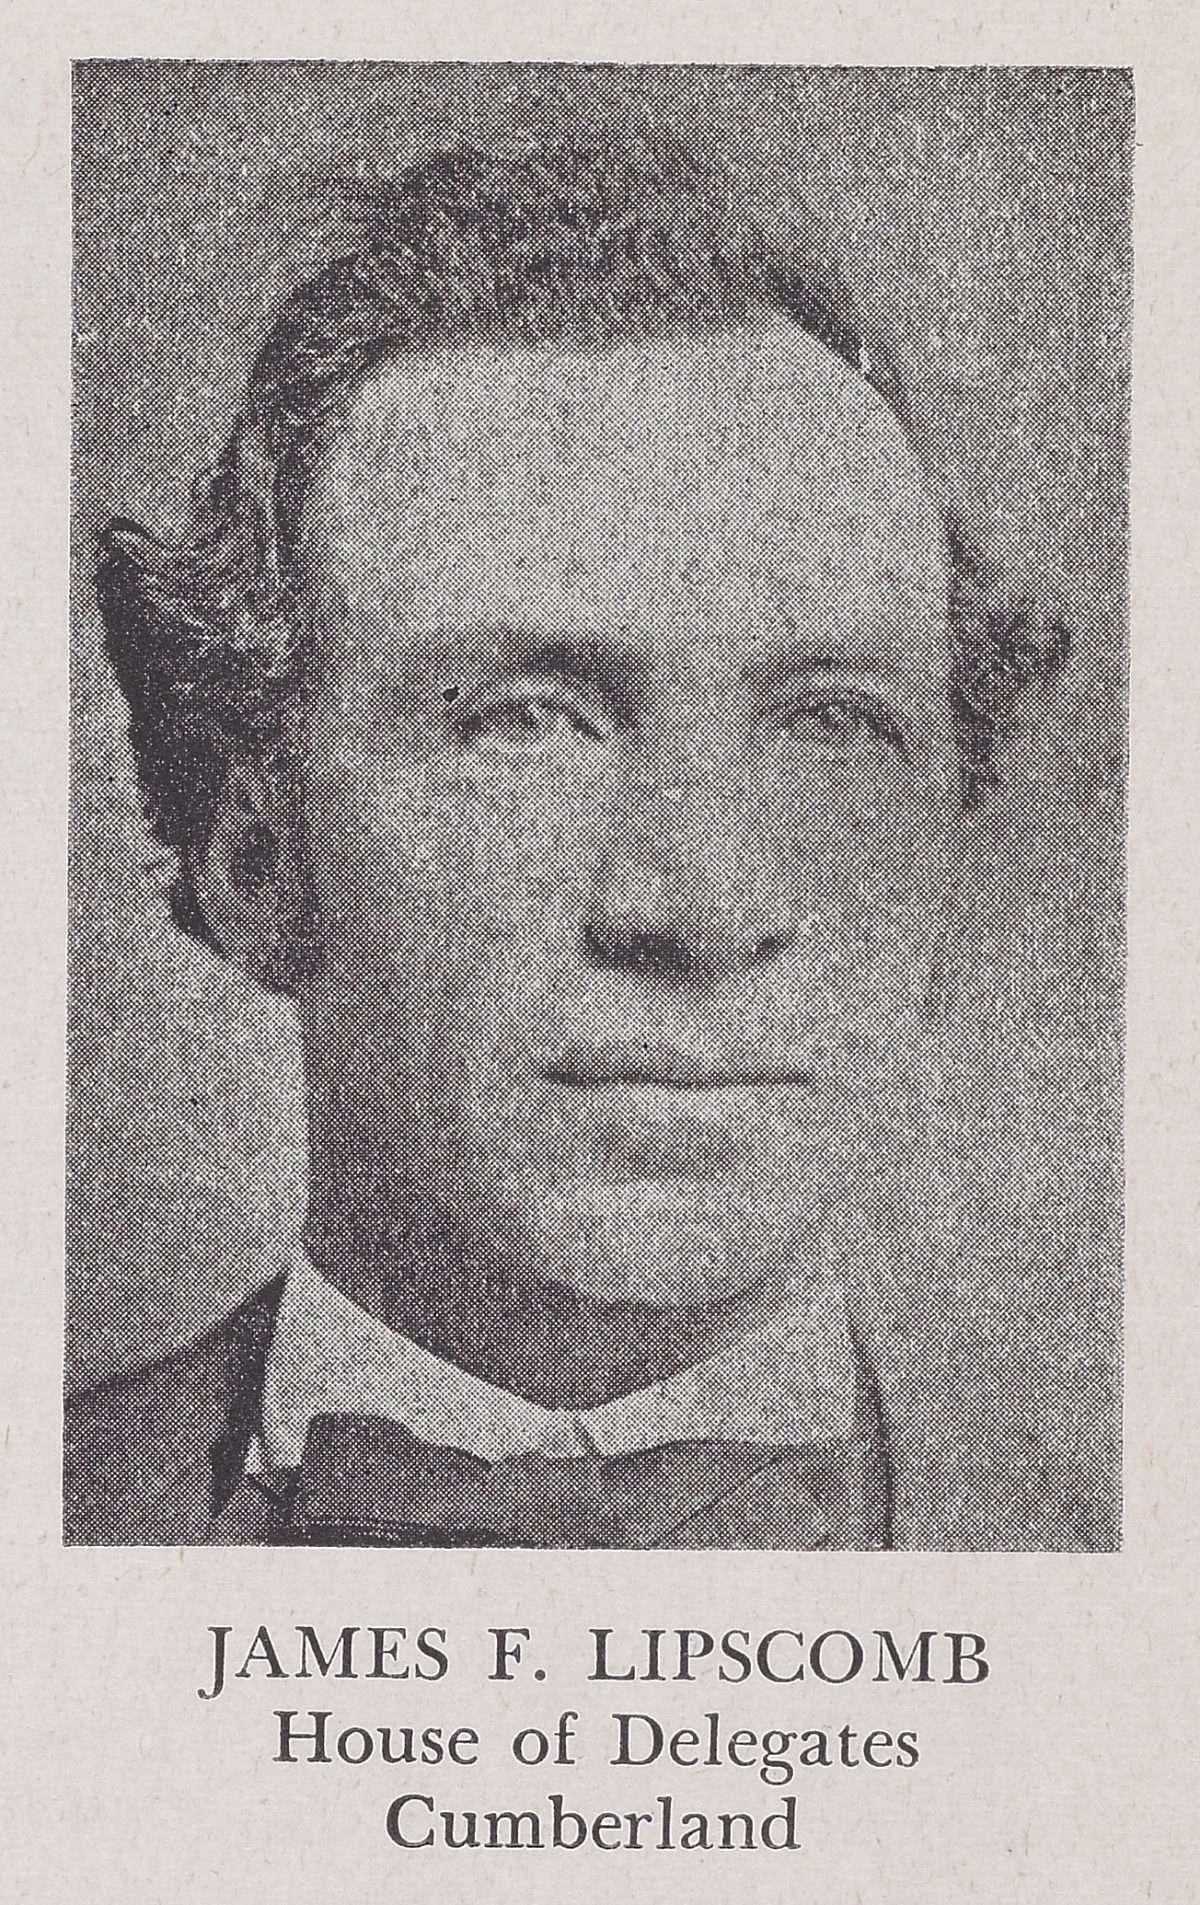 James F. Lipscomb